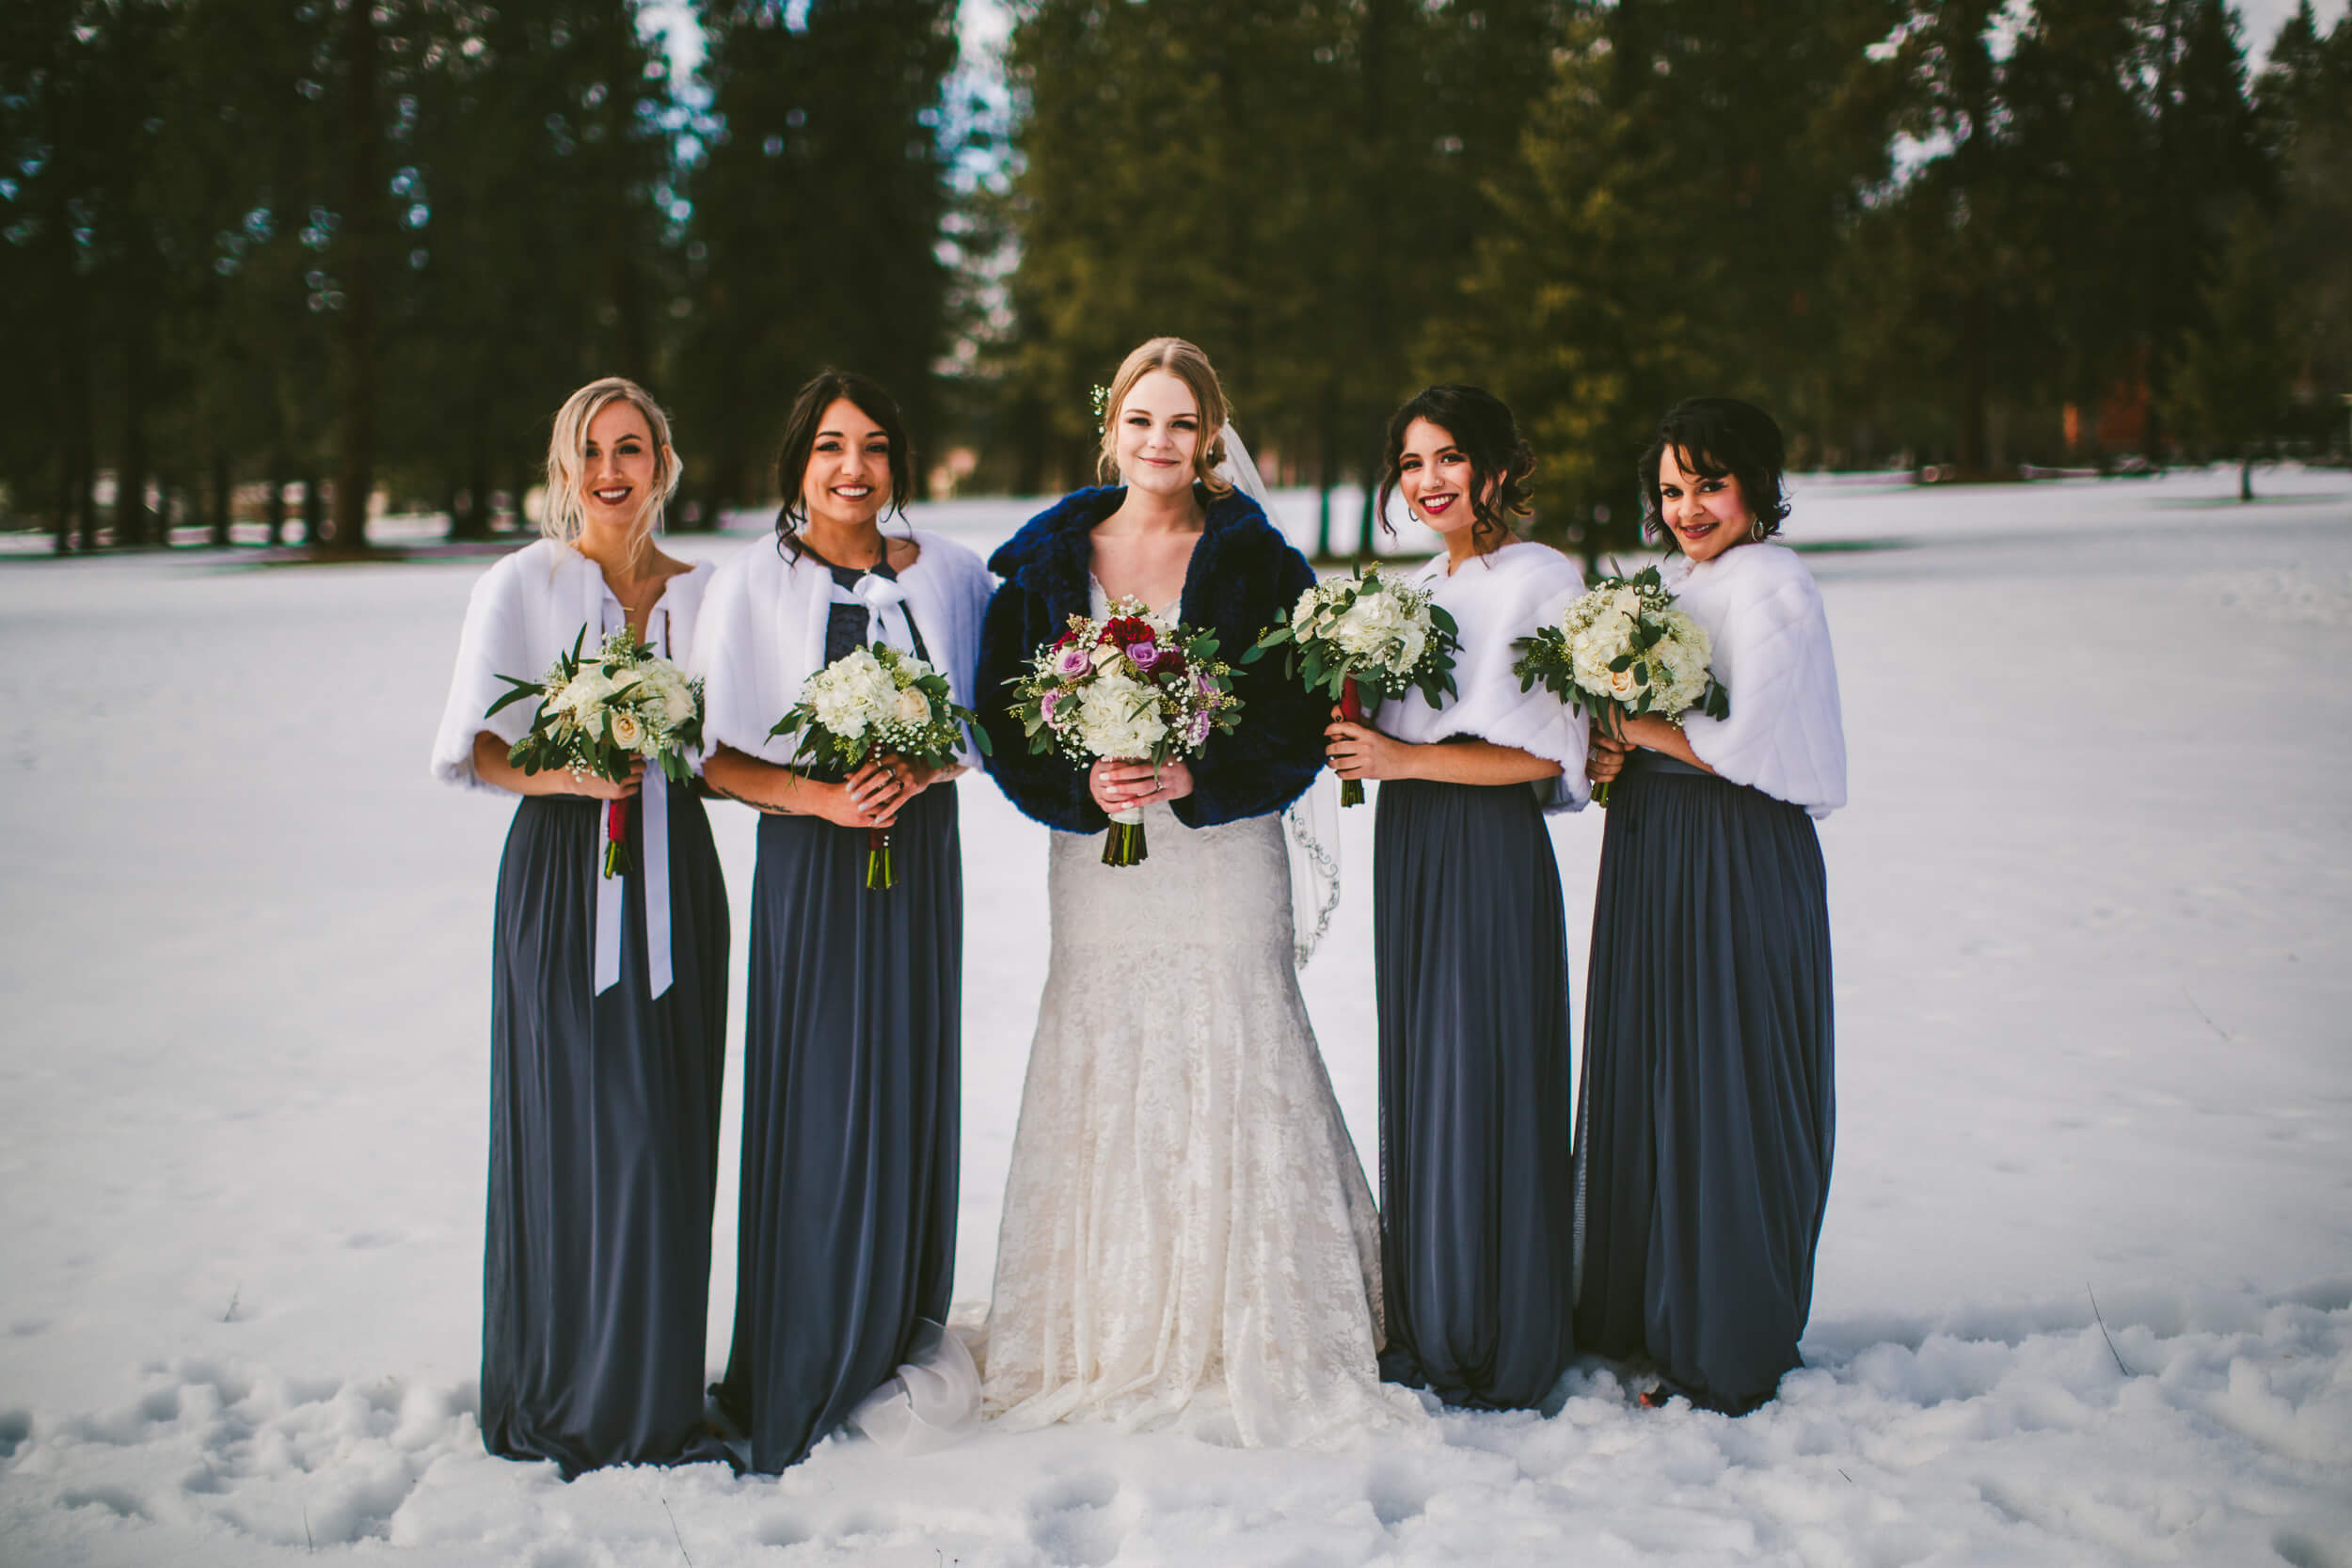 mukogawa winter wedding in spokane (101).jpg